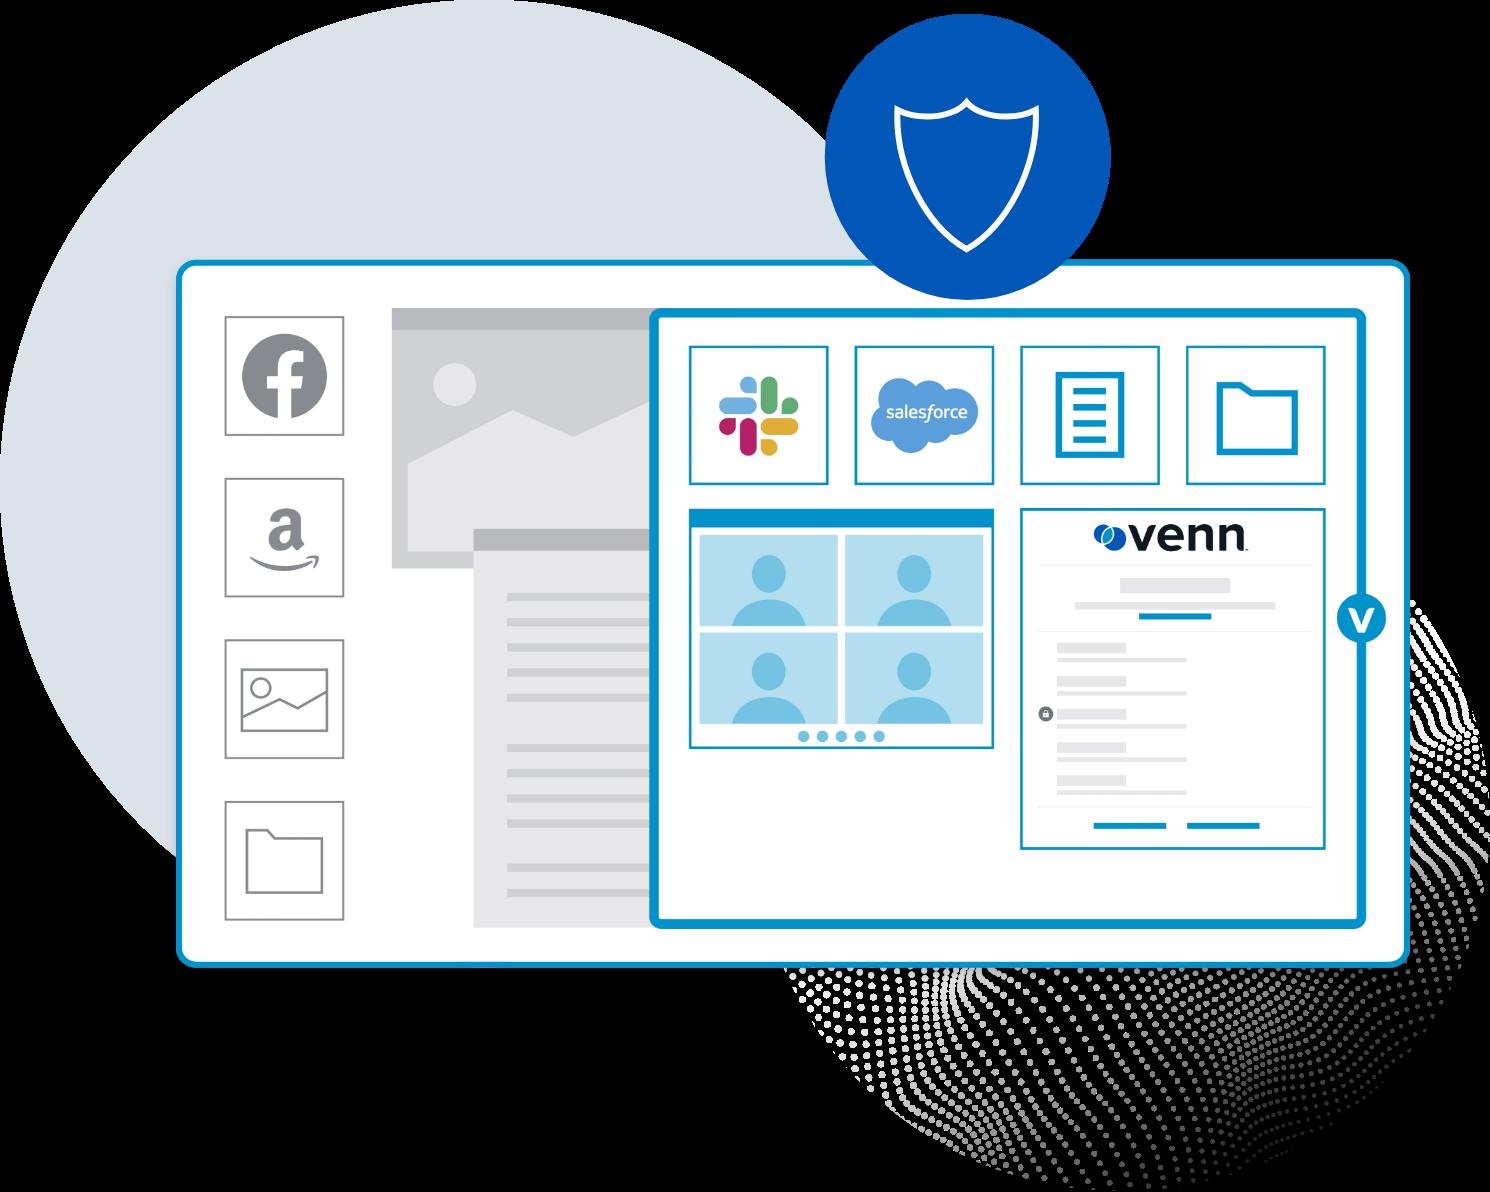 Venn is the new approach to virtual desktop technologies